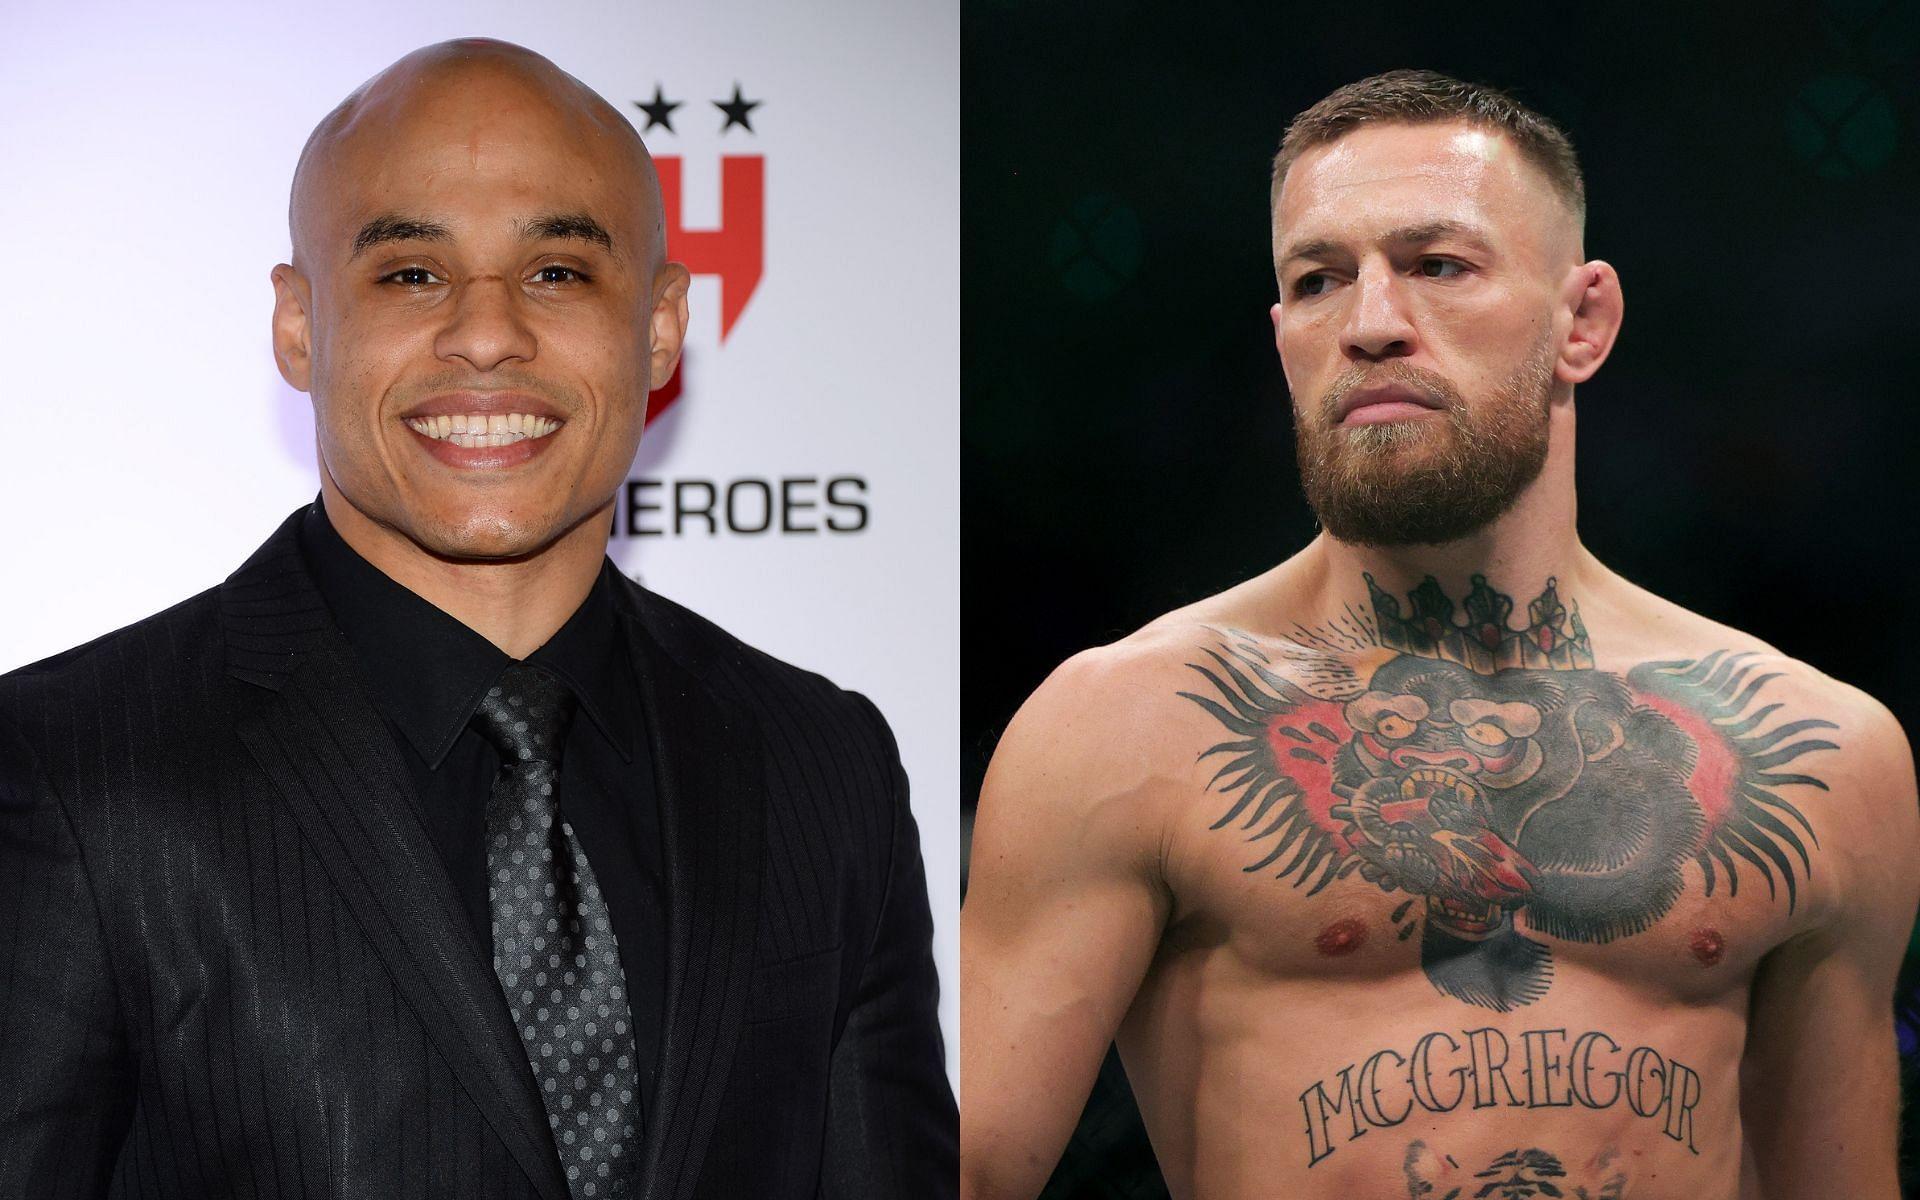 MMA manager Ali Abdelaziz (left) and UFC lightweight superstar Conor McGregor (right)